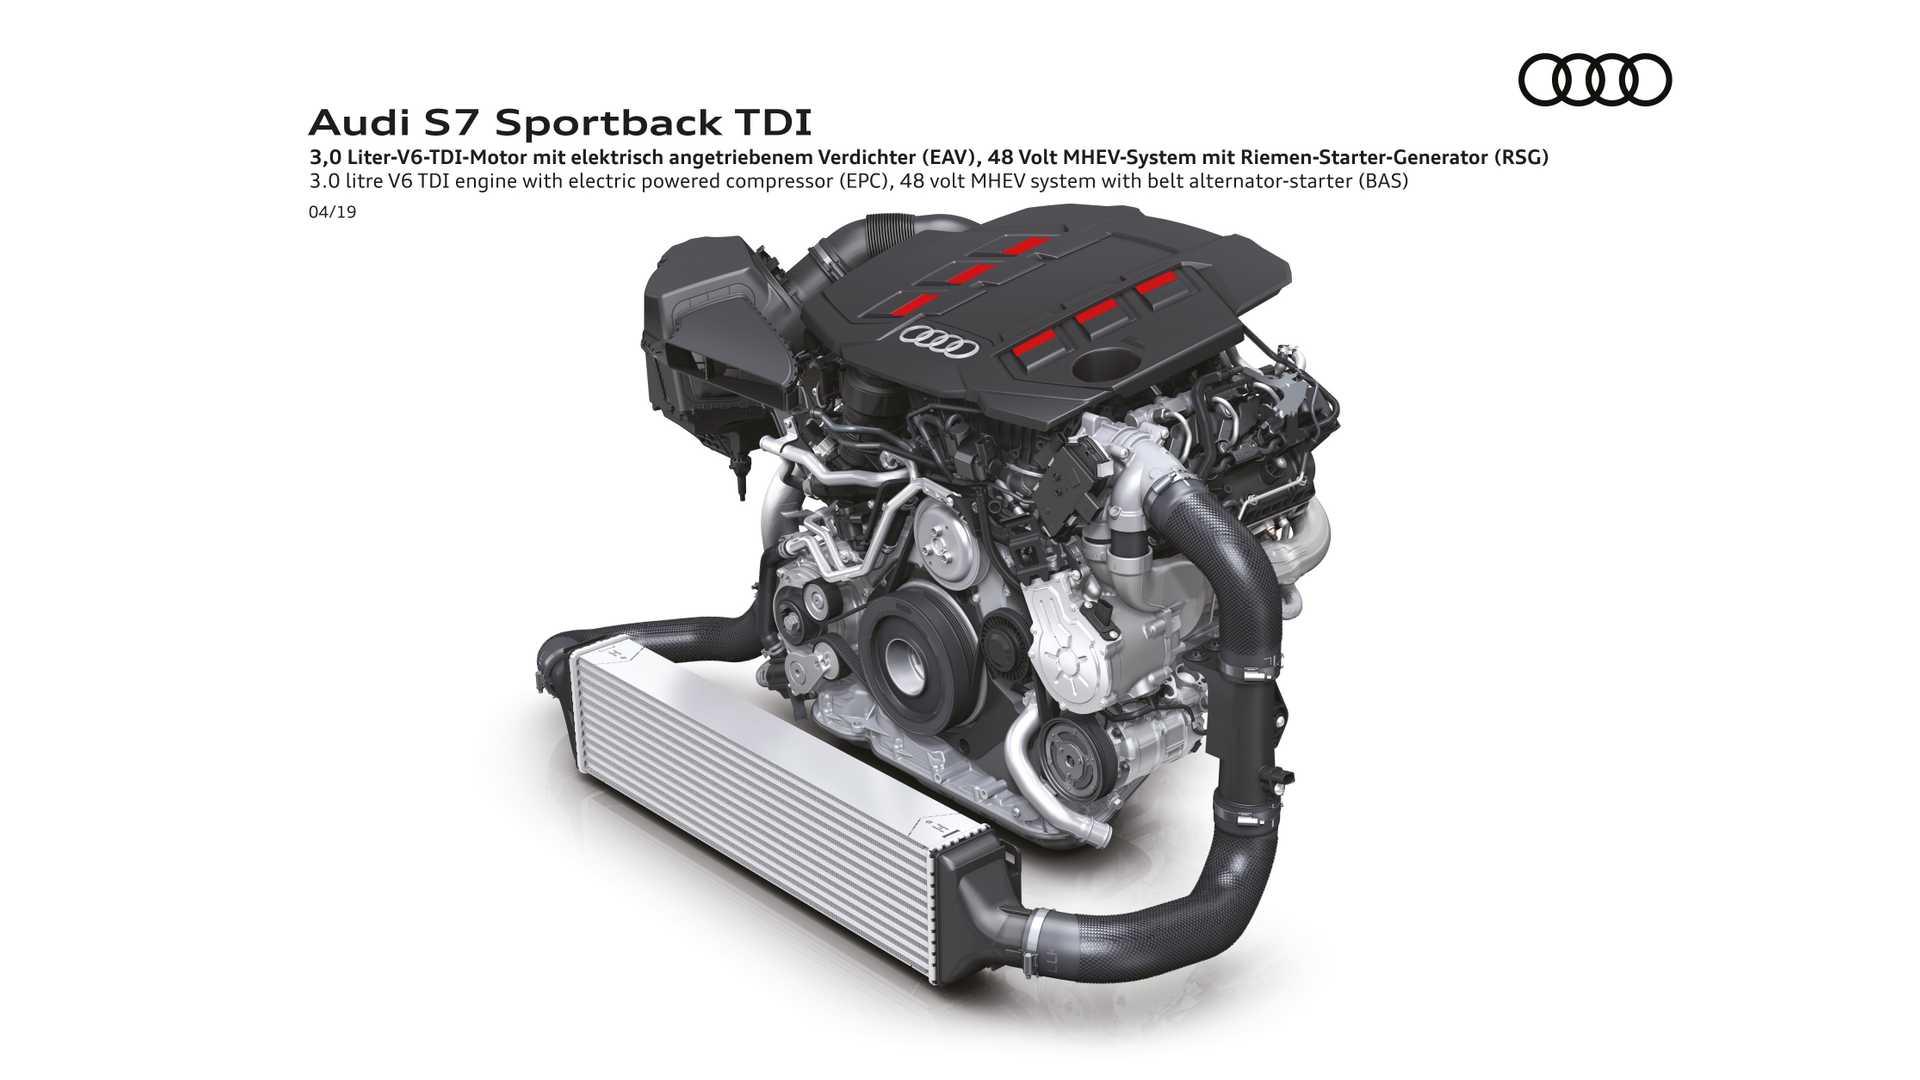 Мотор Audi S7